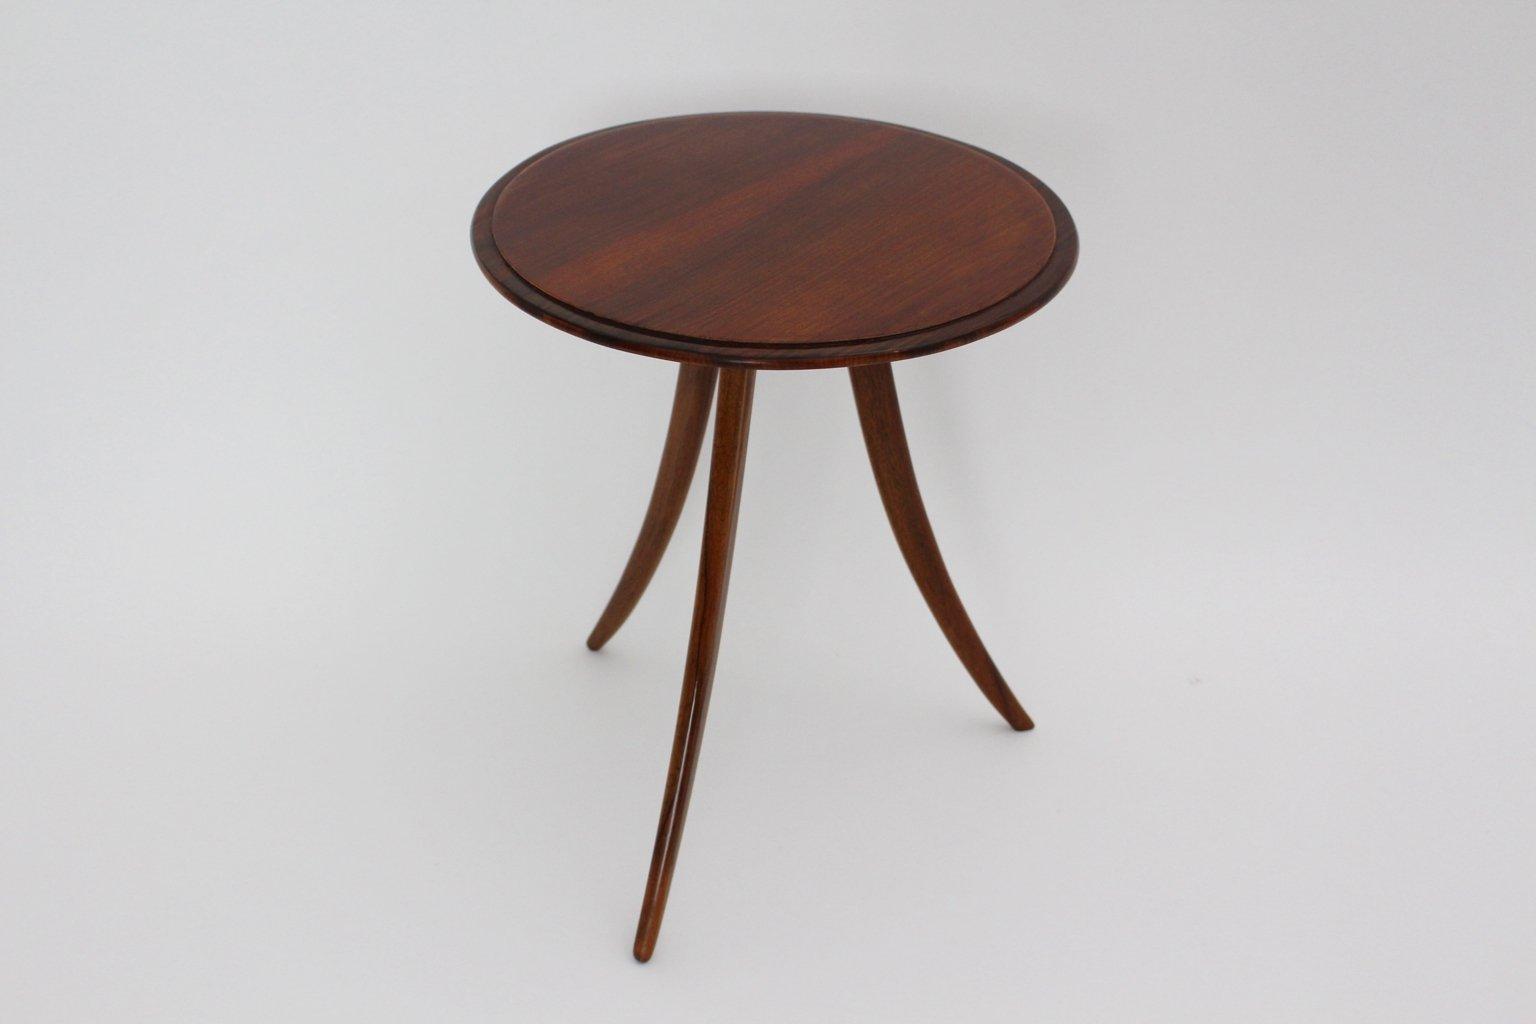 table basse trois pieds maison design. Black Bedroom Furniture Sets. Home Design Ideas